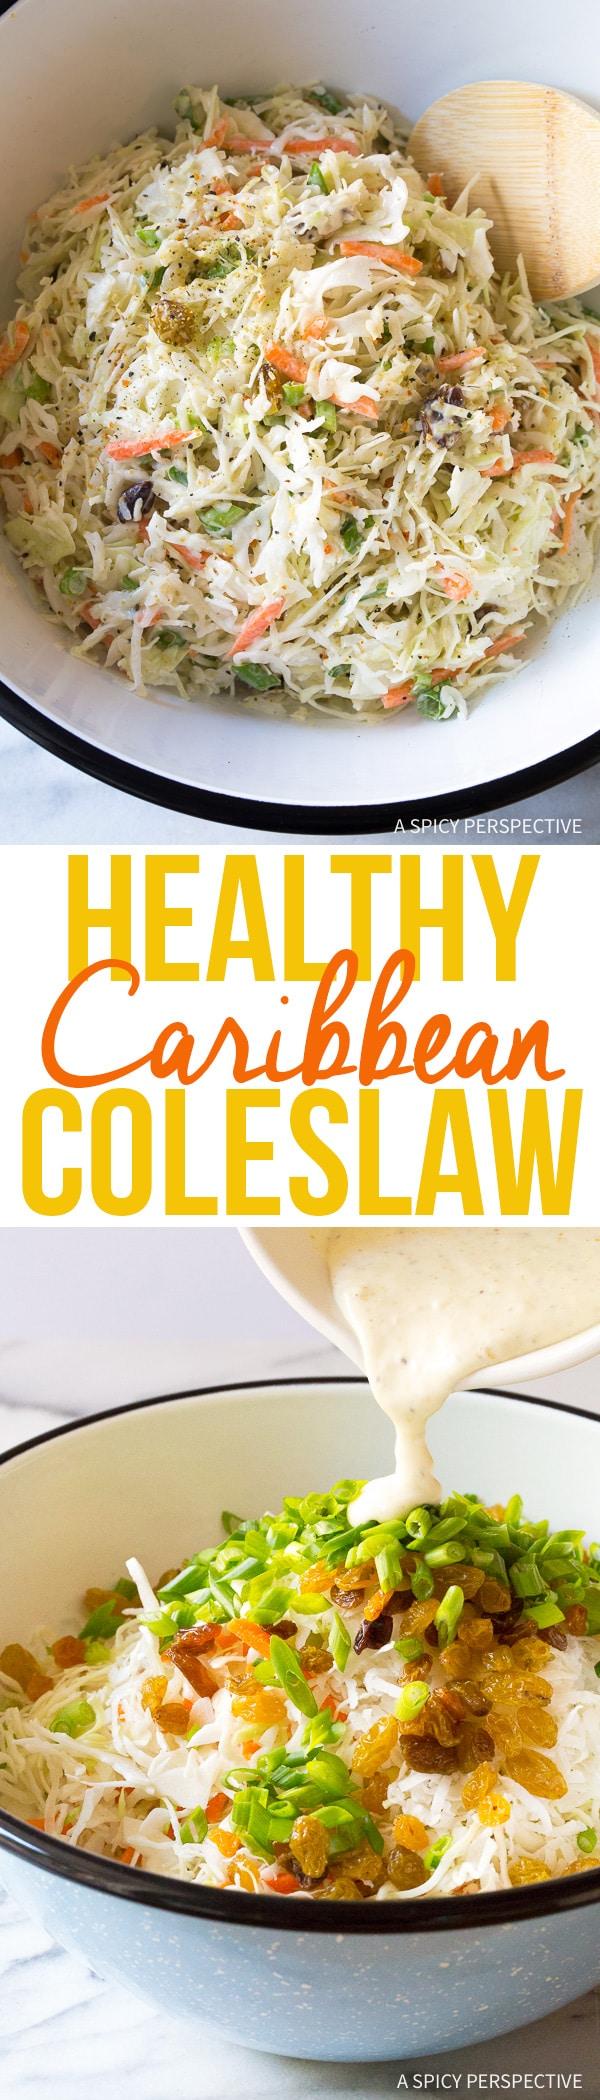 Healthy Caribbean Coleslaw Recipe (Lean, Gluten Free & Dairy Free!)